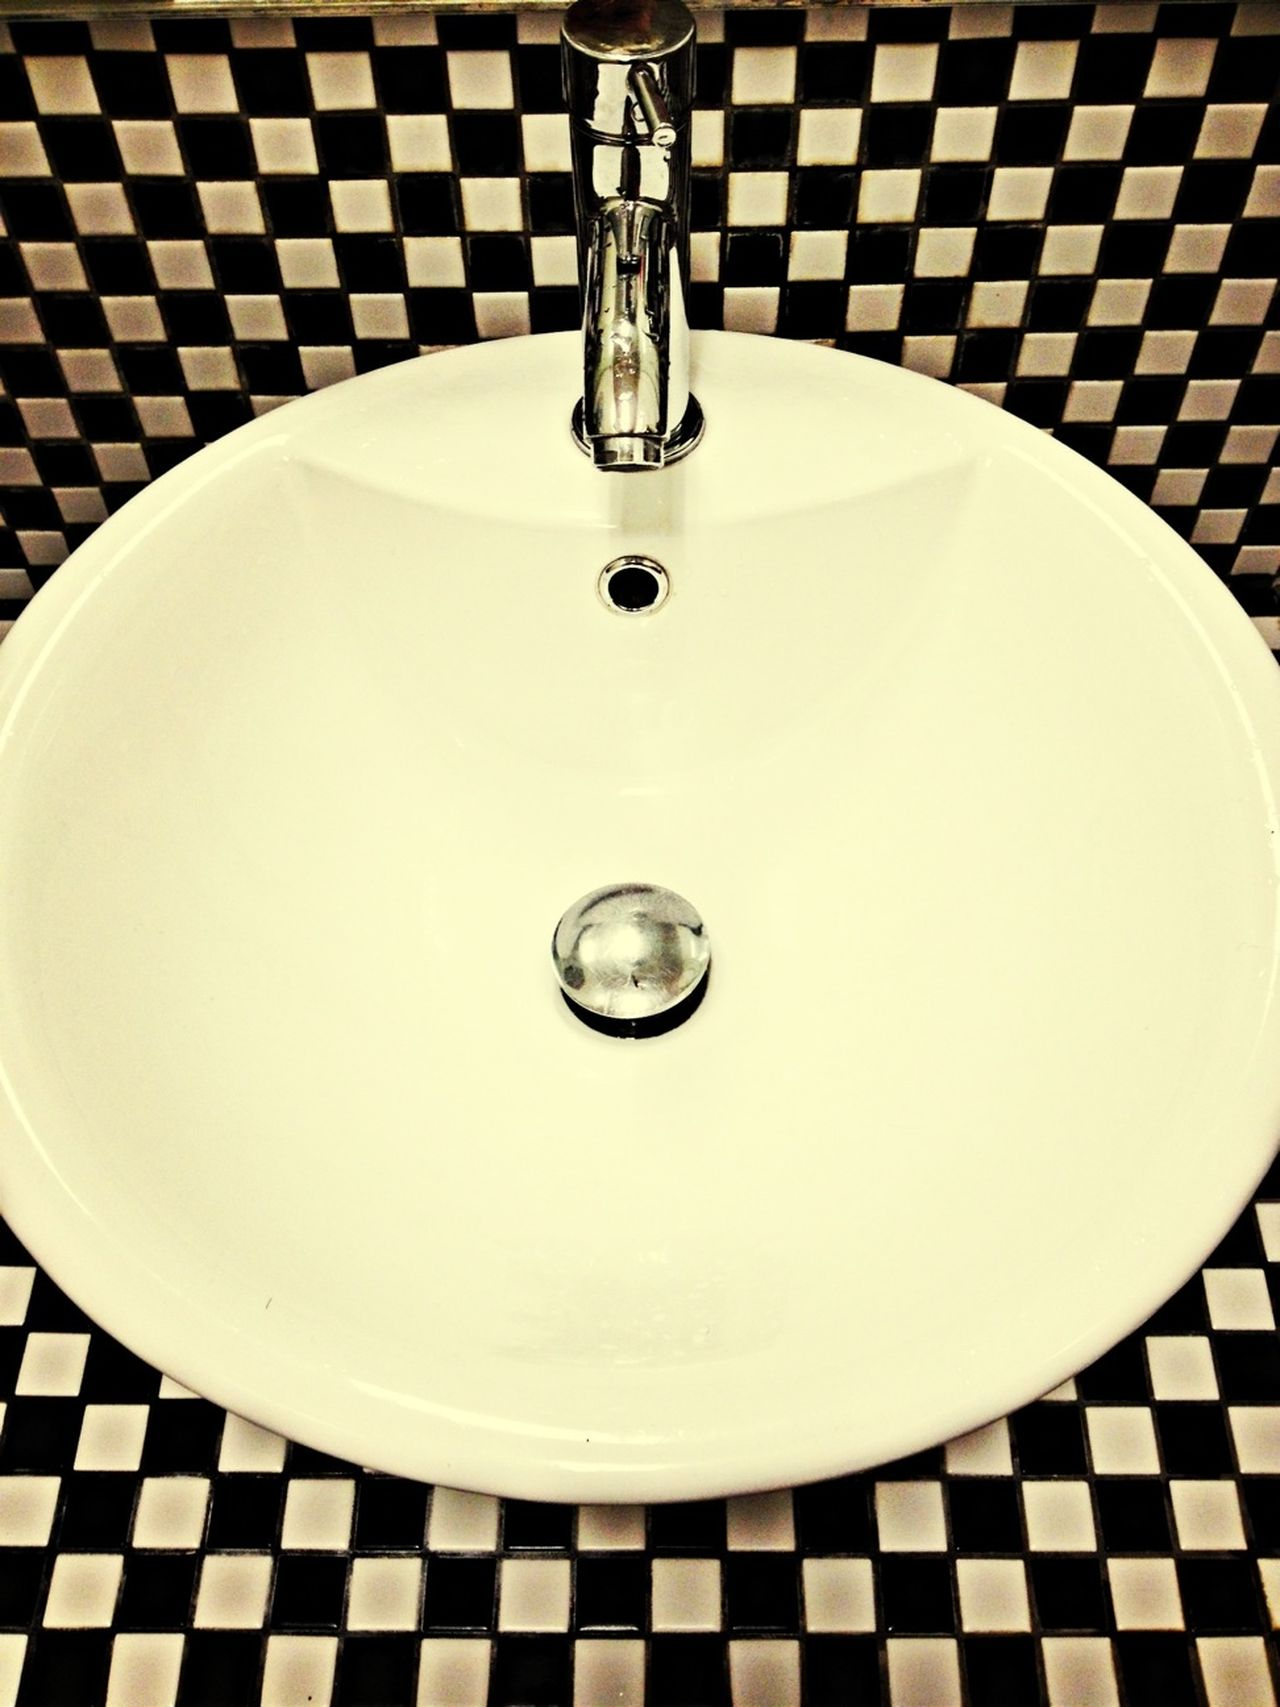 Blackandwhite Tiles Bathroom Frame It!